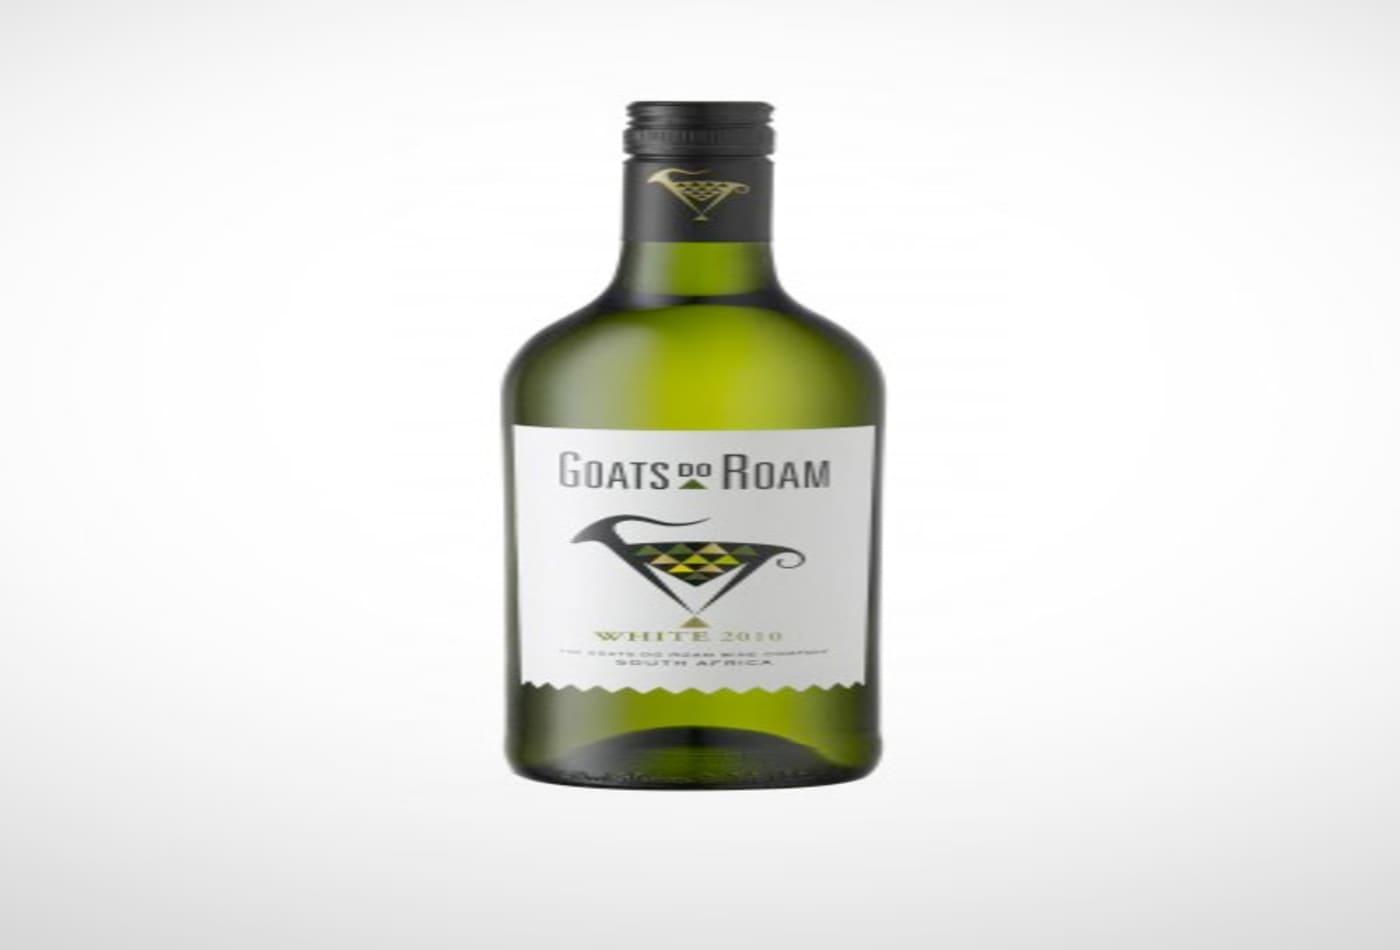 Unique-Wines-goats-do-roam.jpg